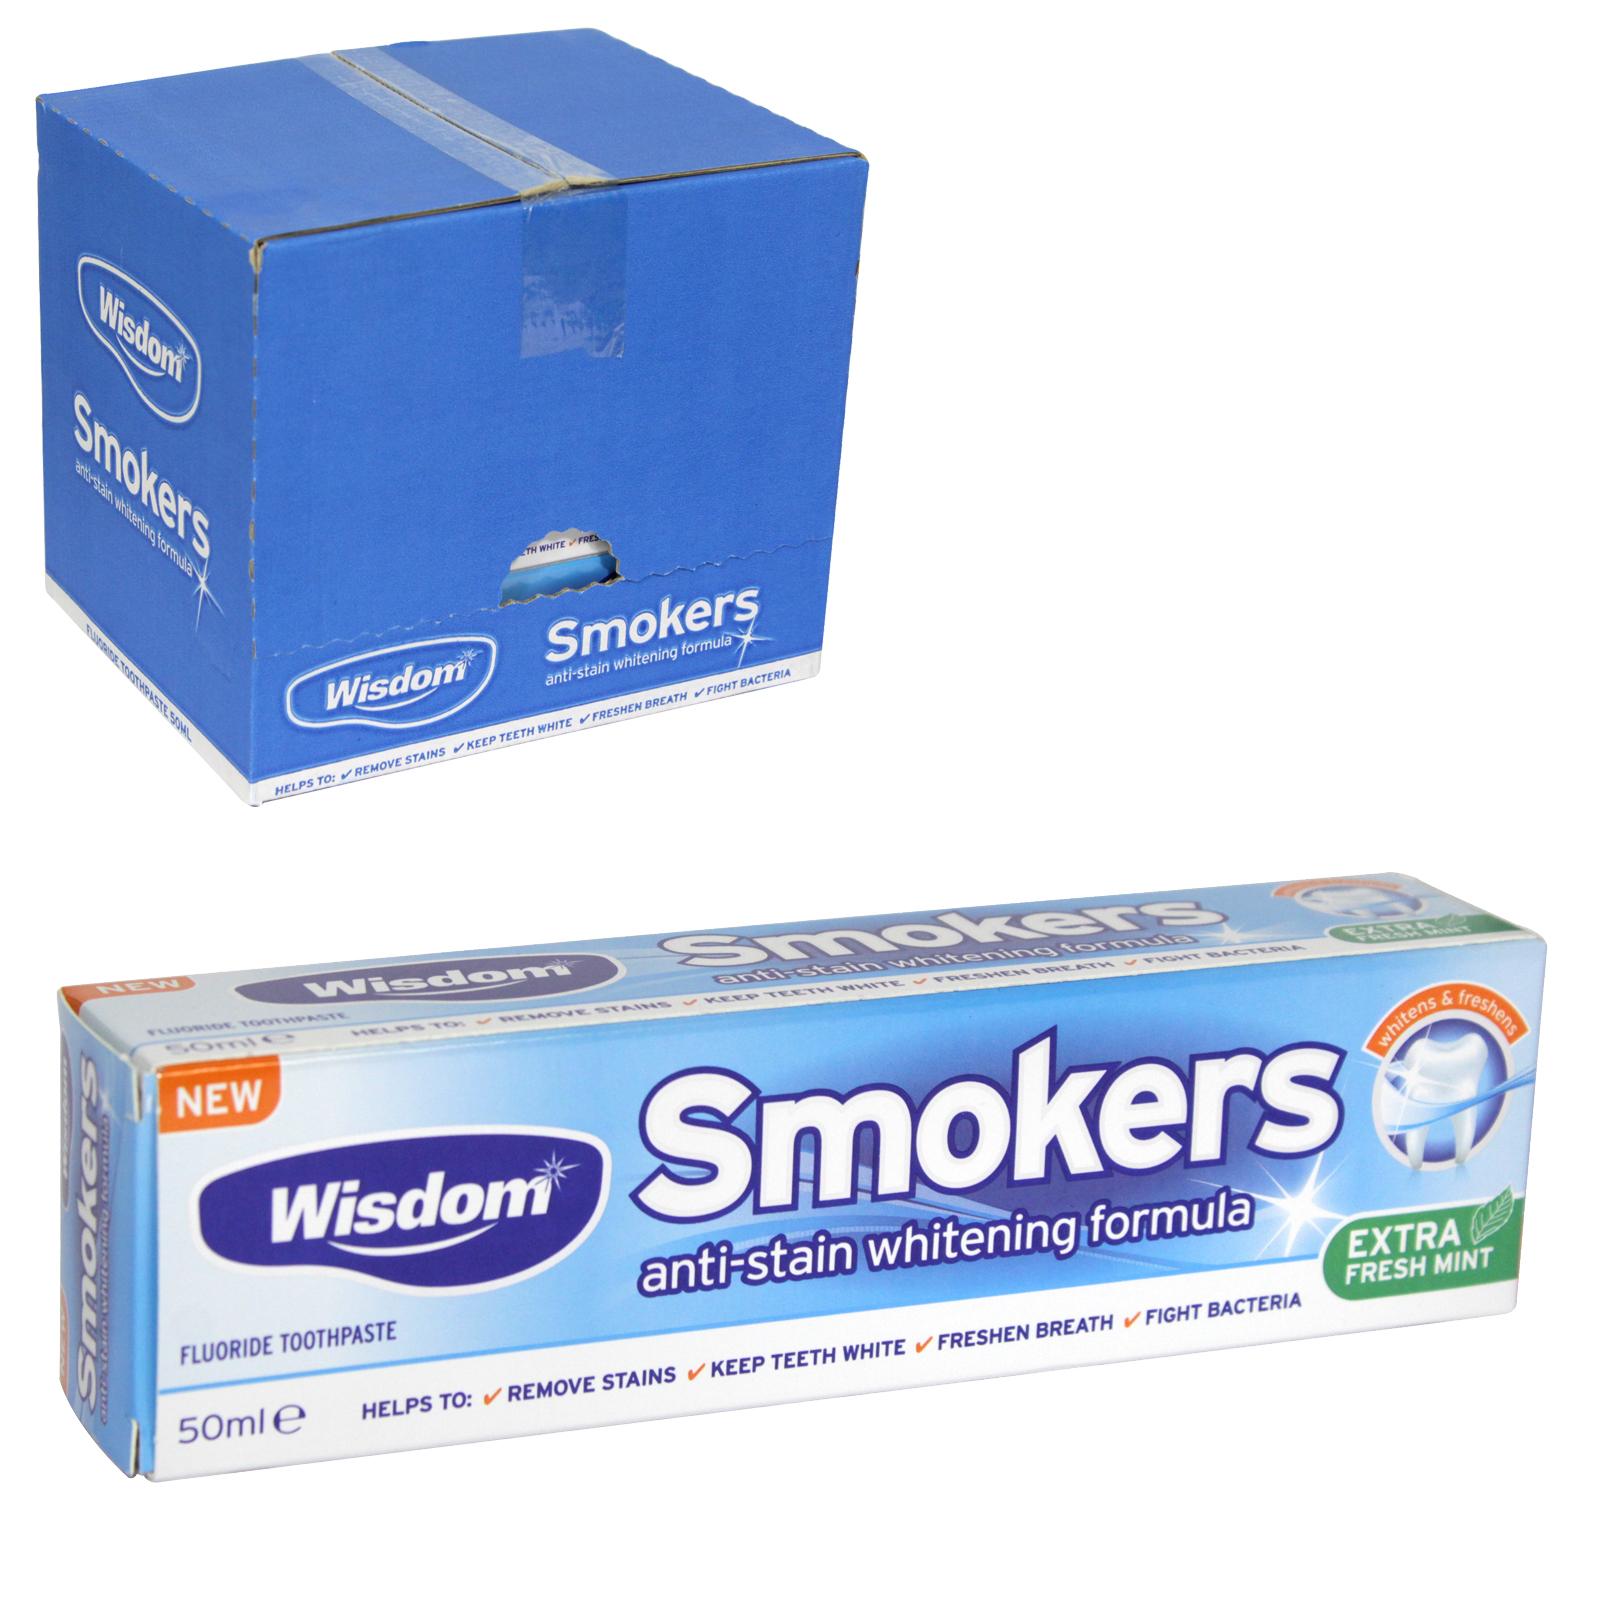 WISDOM SMOKERS TOOTHPASTE 50ML X12